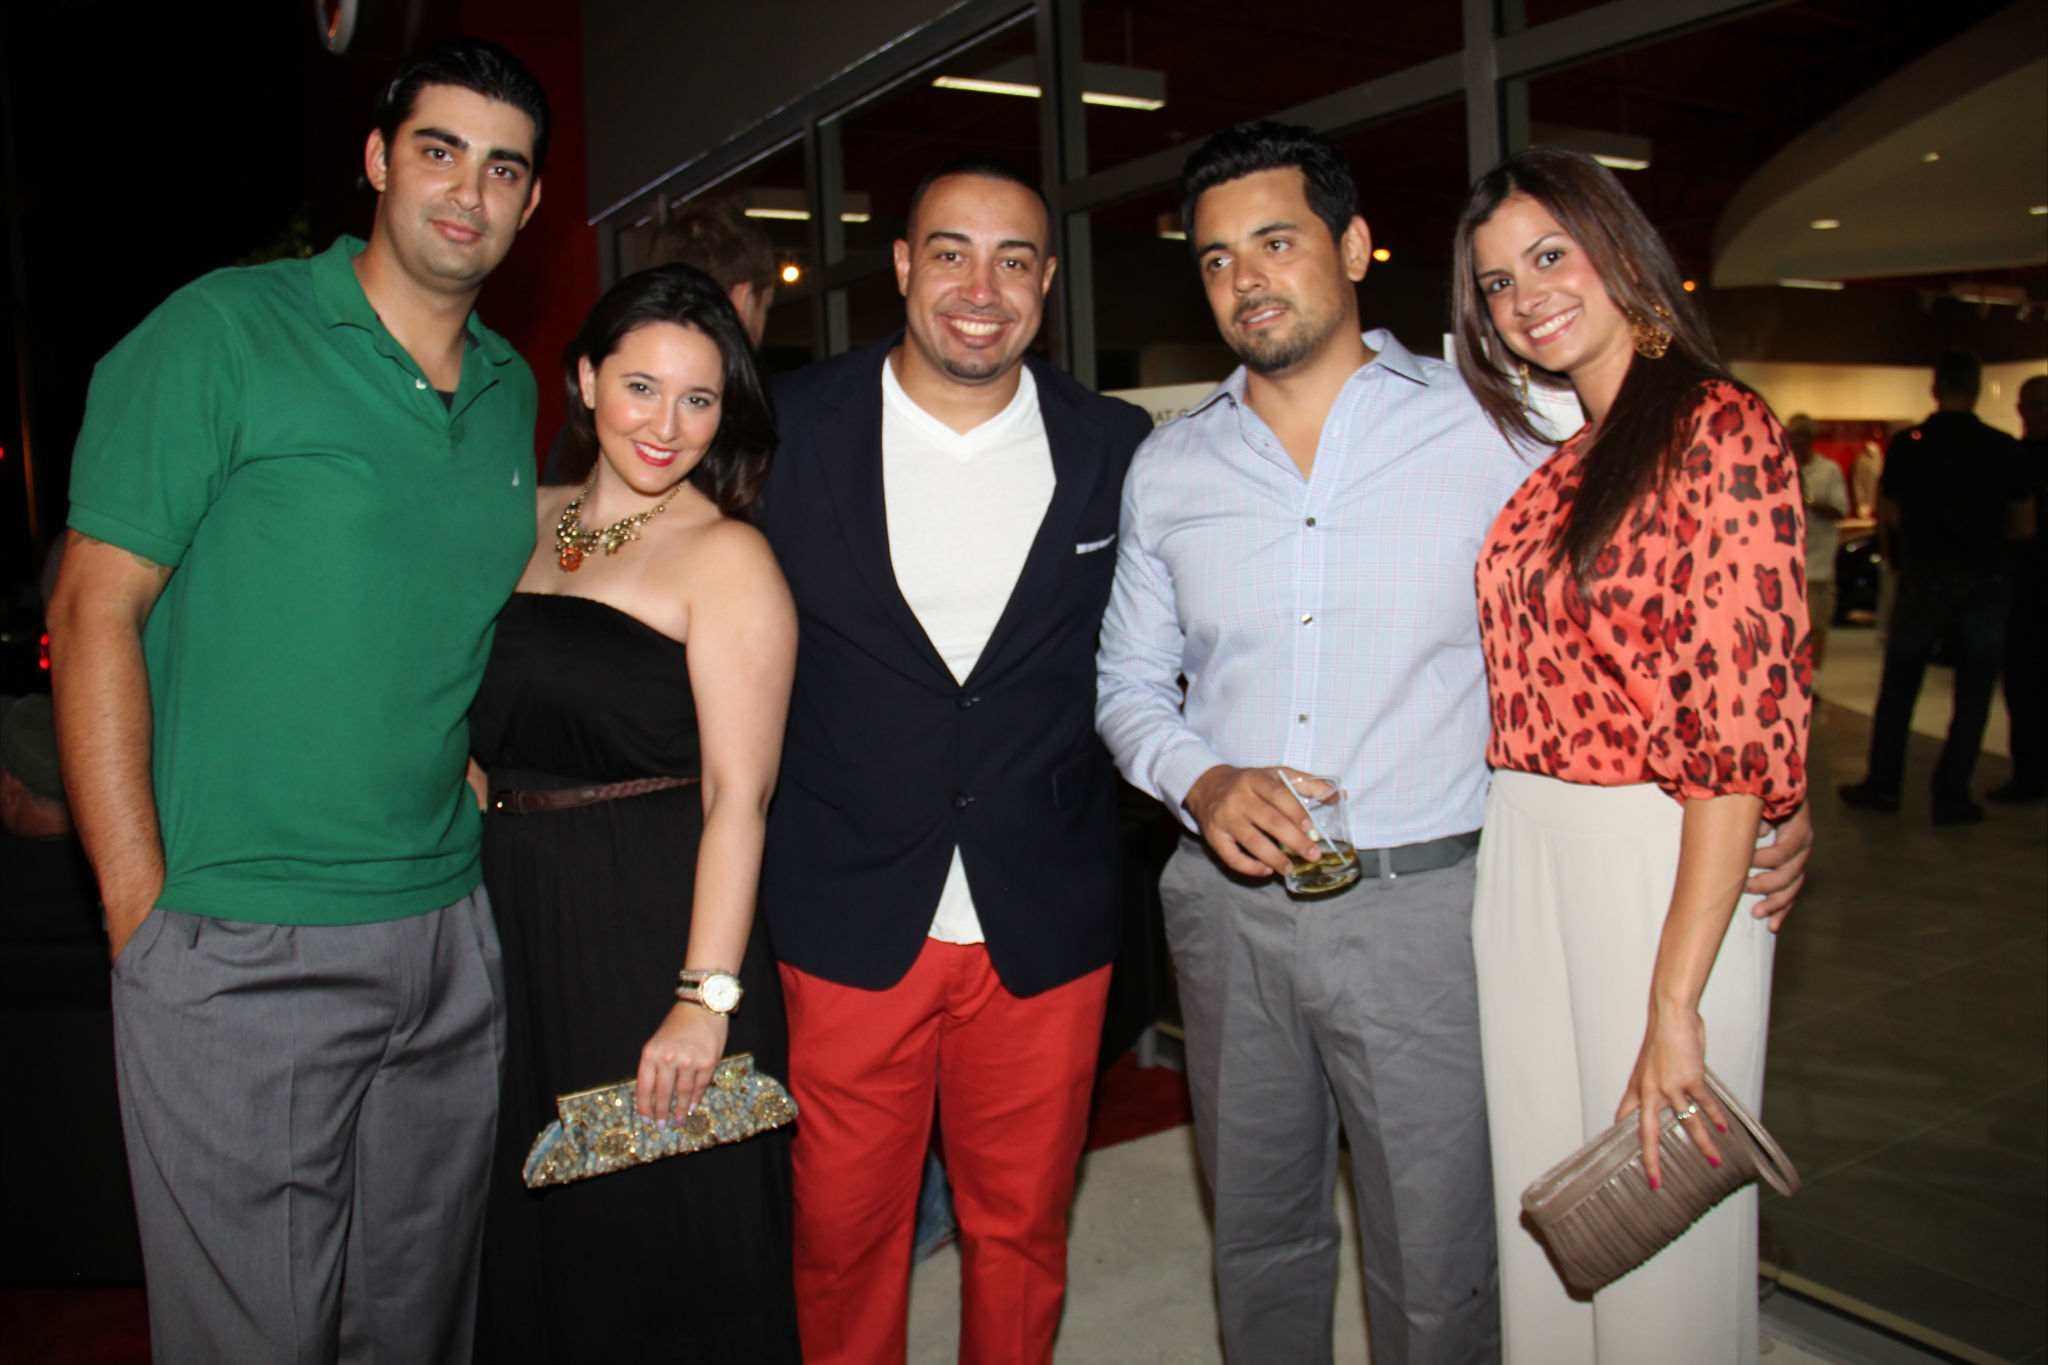 Luis Perez, Stephanie Perez, Danny Fonticiella, Erick Vargas